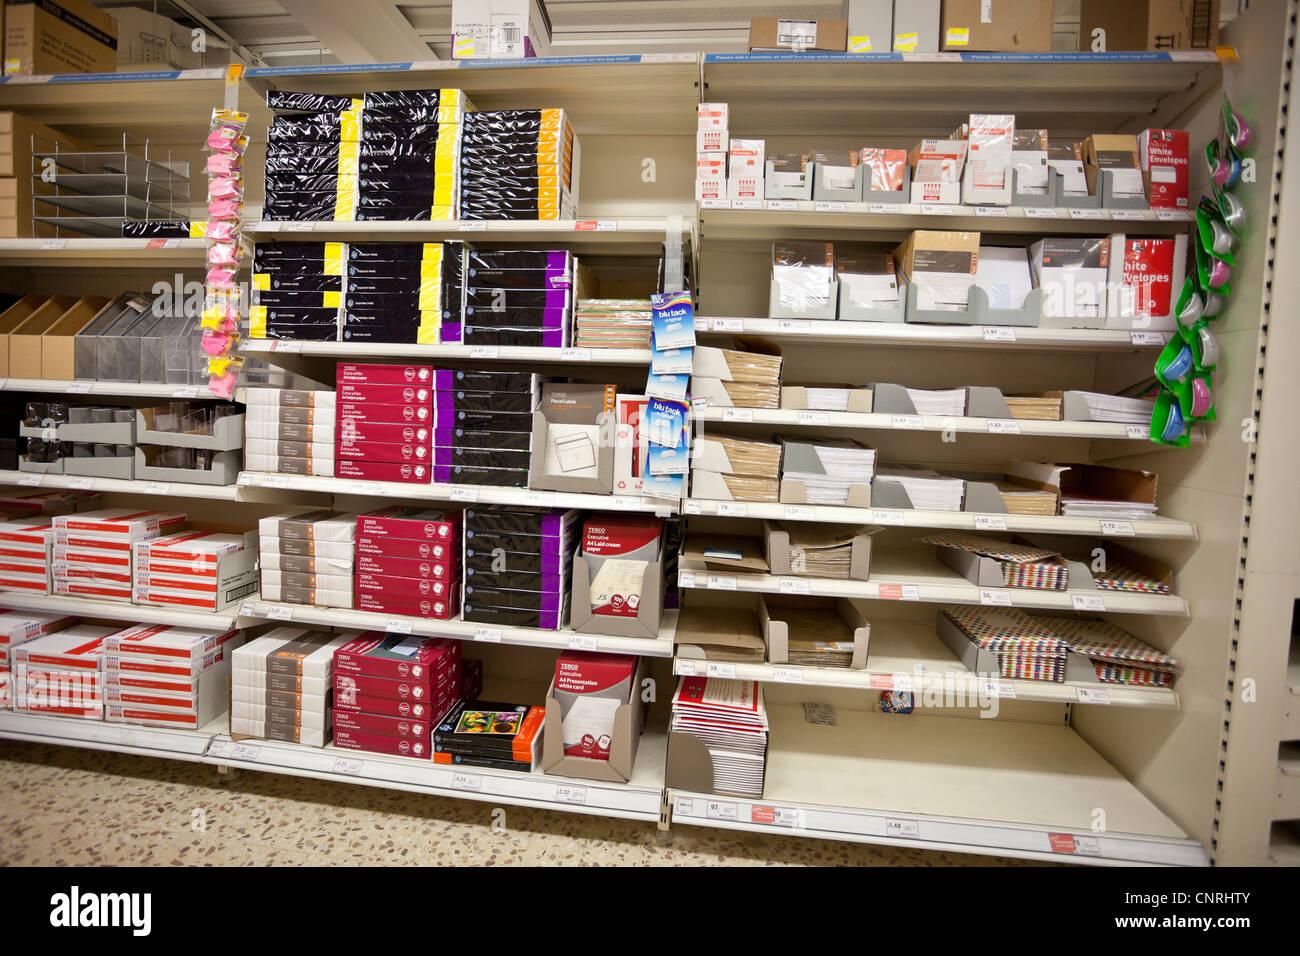 Stationary shelves in a shop, London, England, UK - Stock Image